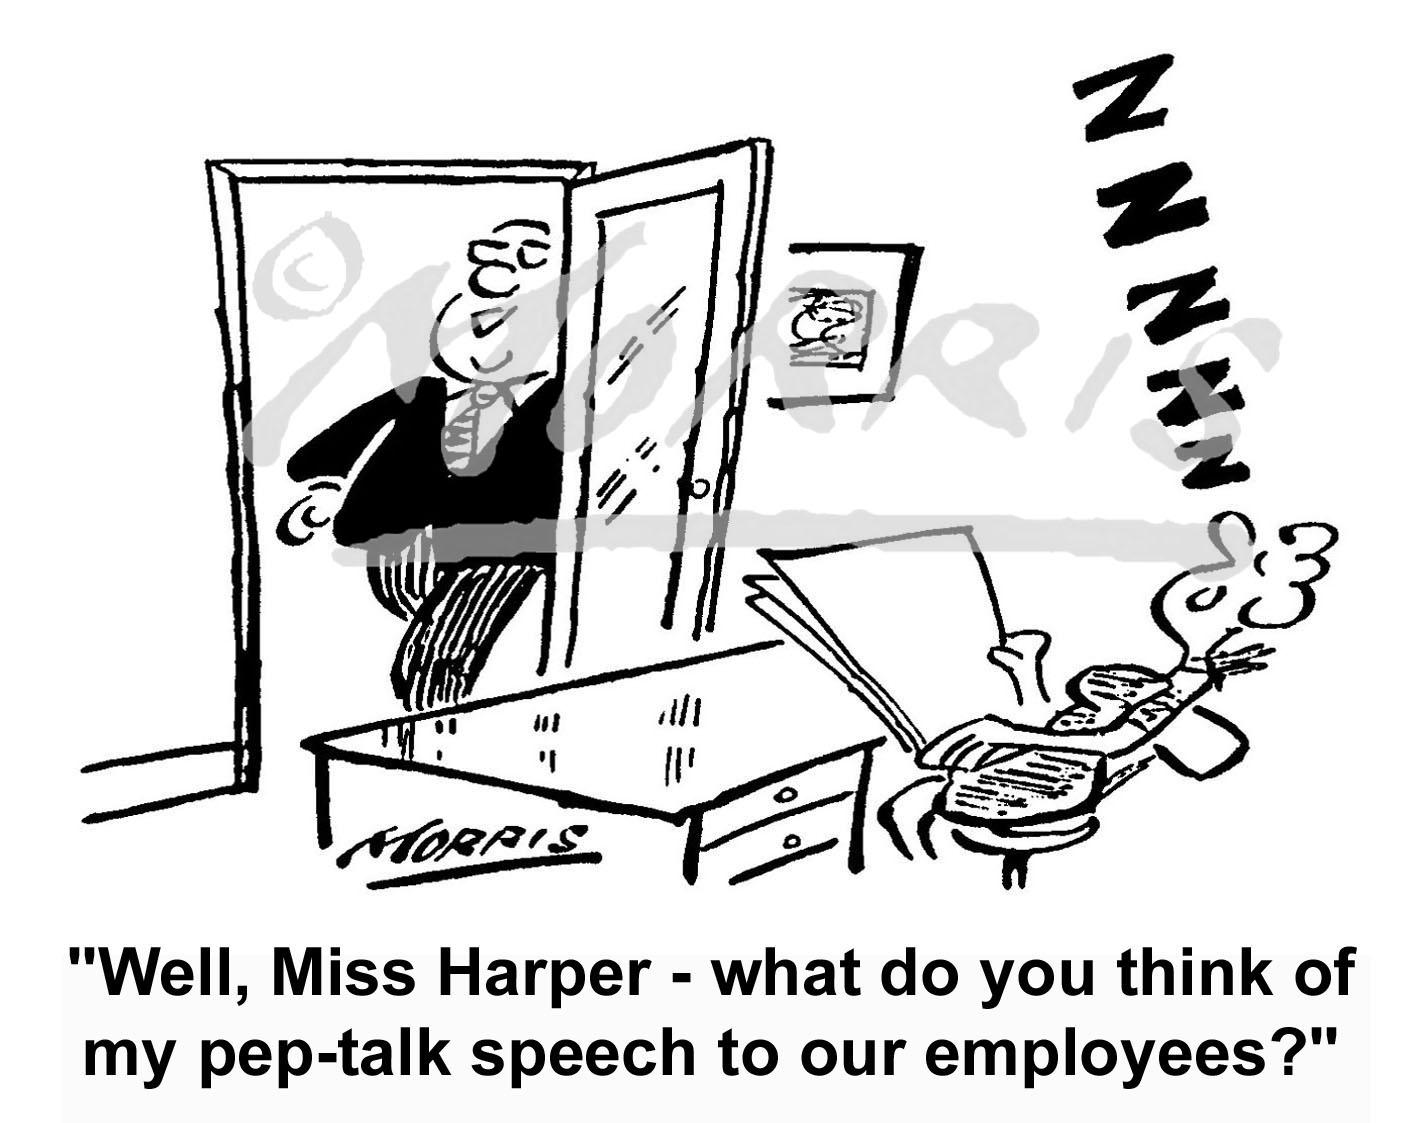 Motivation speech to employees cartoon Ref: 1181bw